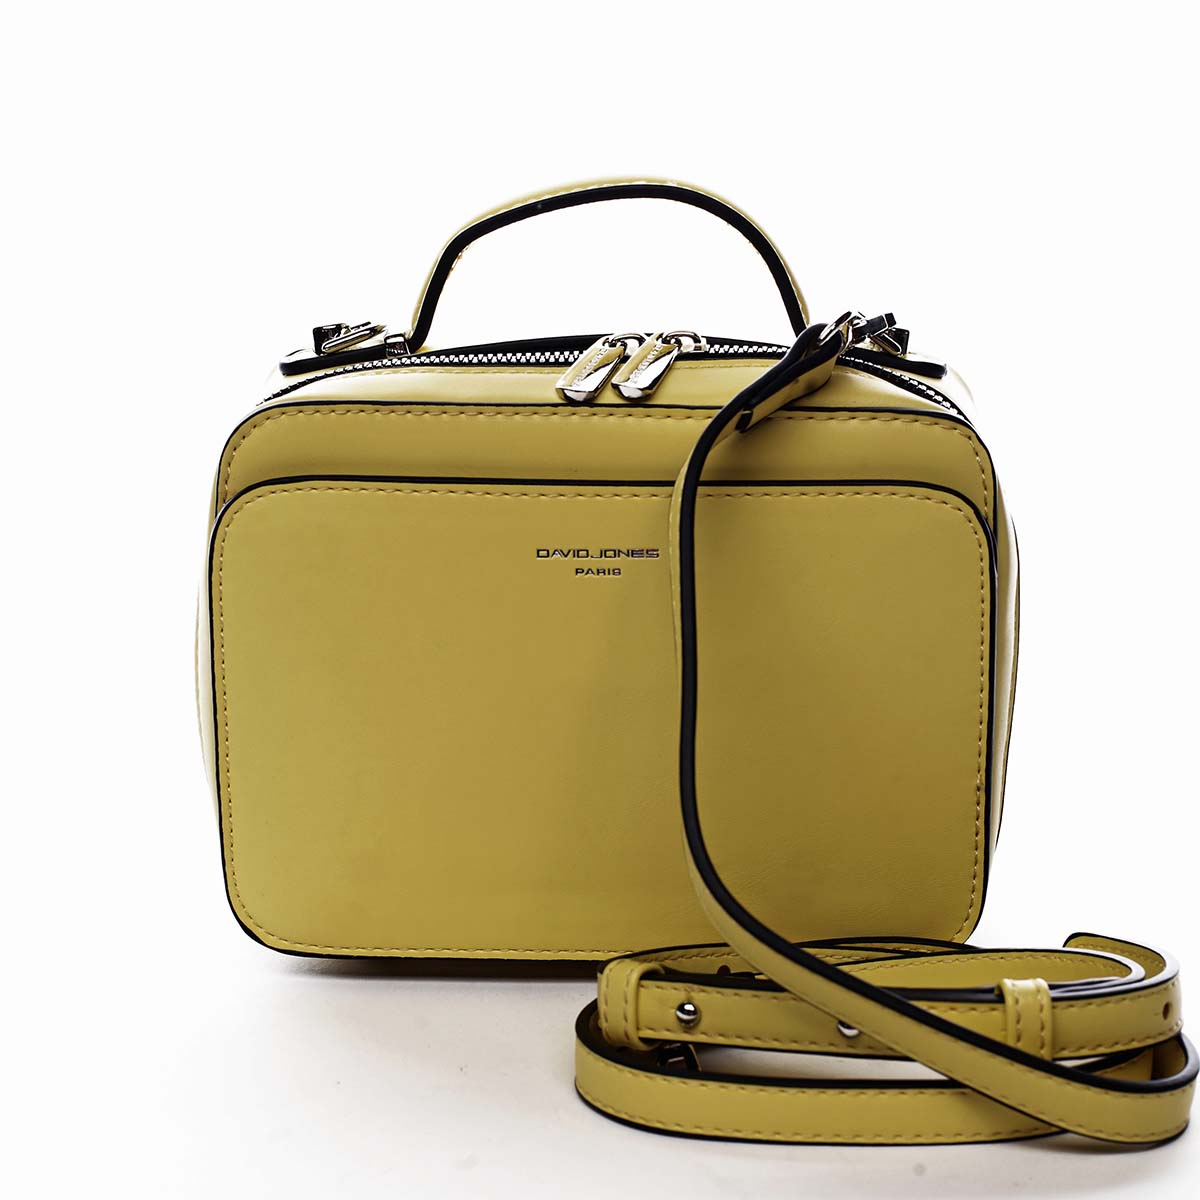 Dámska kabelka žltá - David Jones Zara